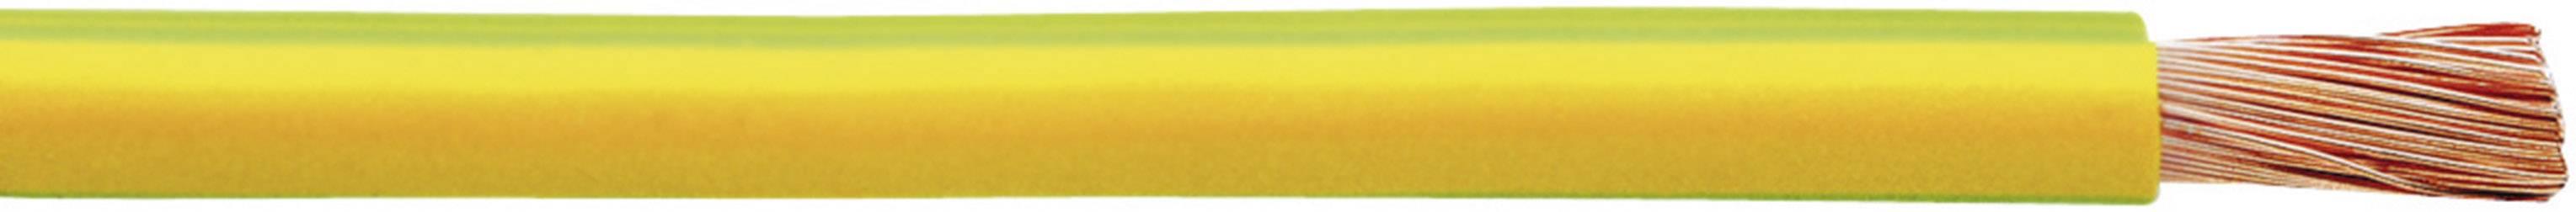 Opletenie / lanko Faber Kabel 040069 H07V-K, 1 x 50 mm², vonkajší Ø 11.60 mm, metrový tovar, čierna